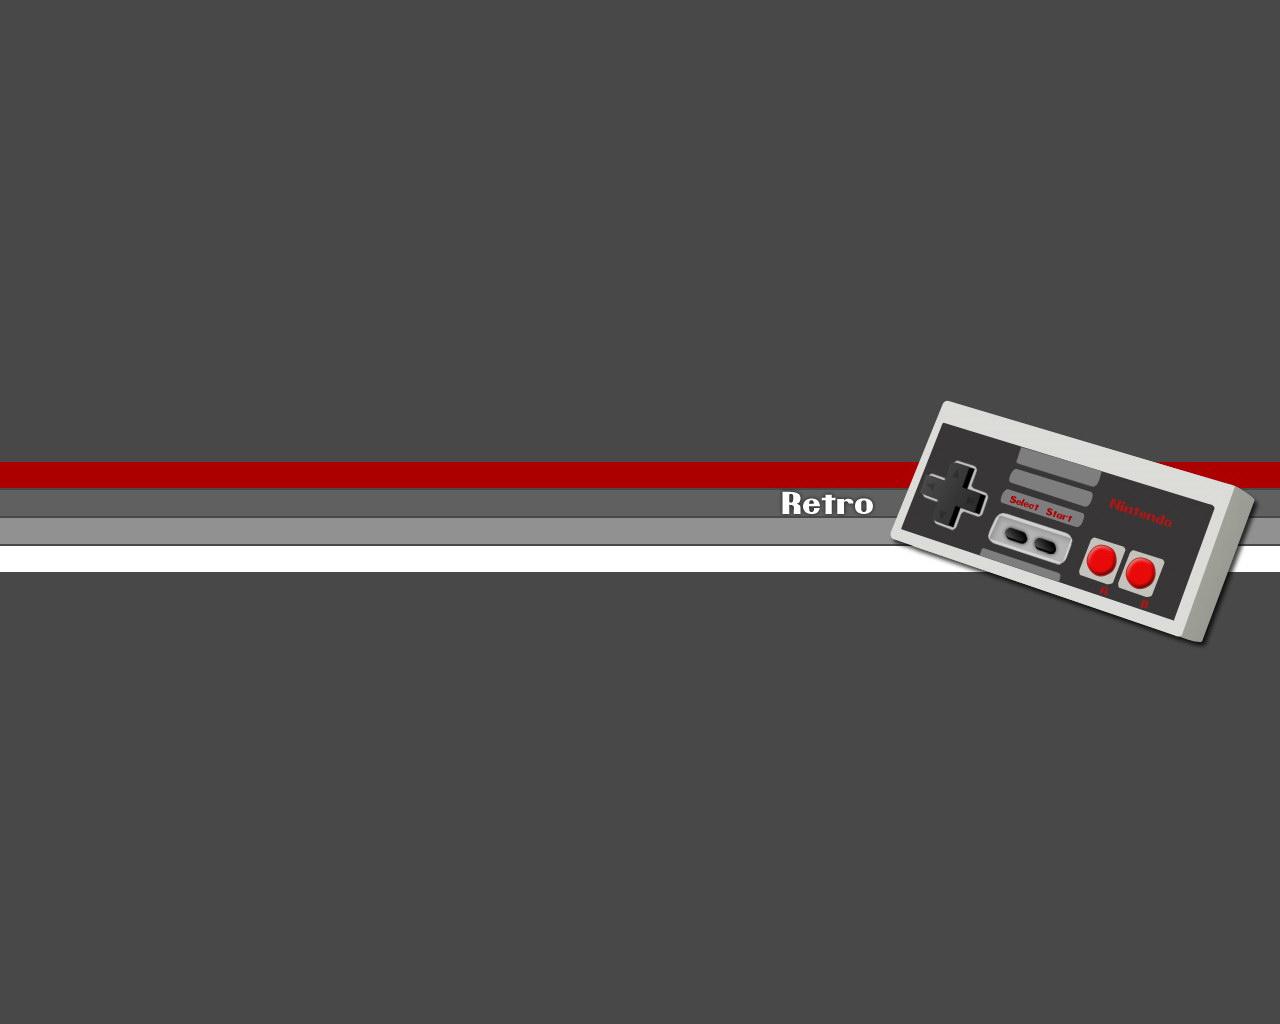 Old school Retro style console controller desktop wallpaper 1280x1024